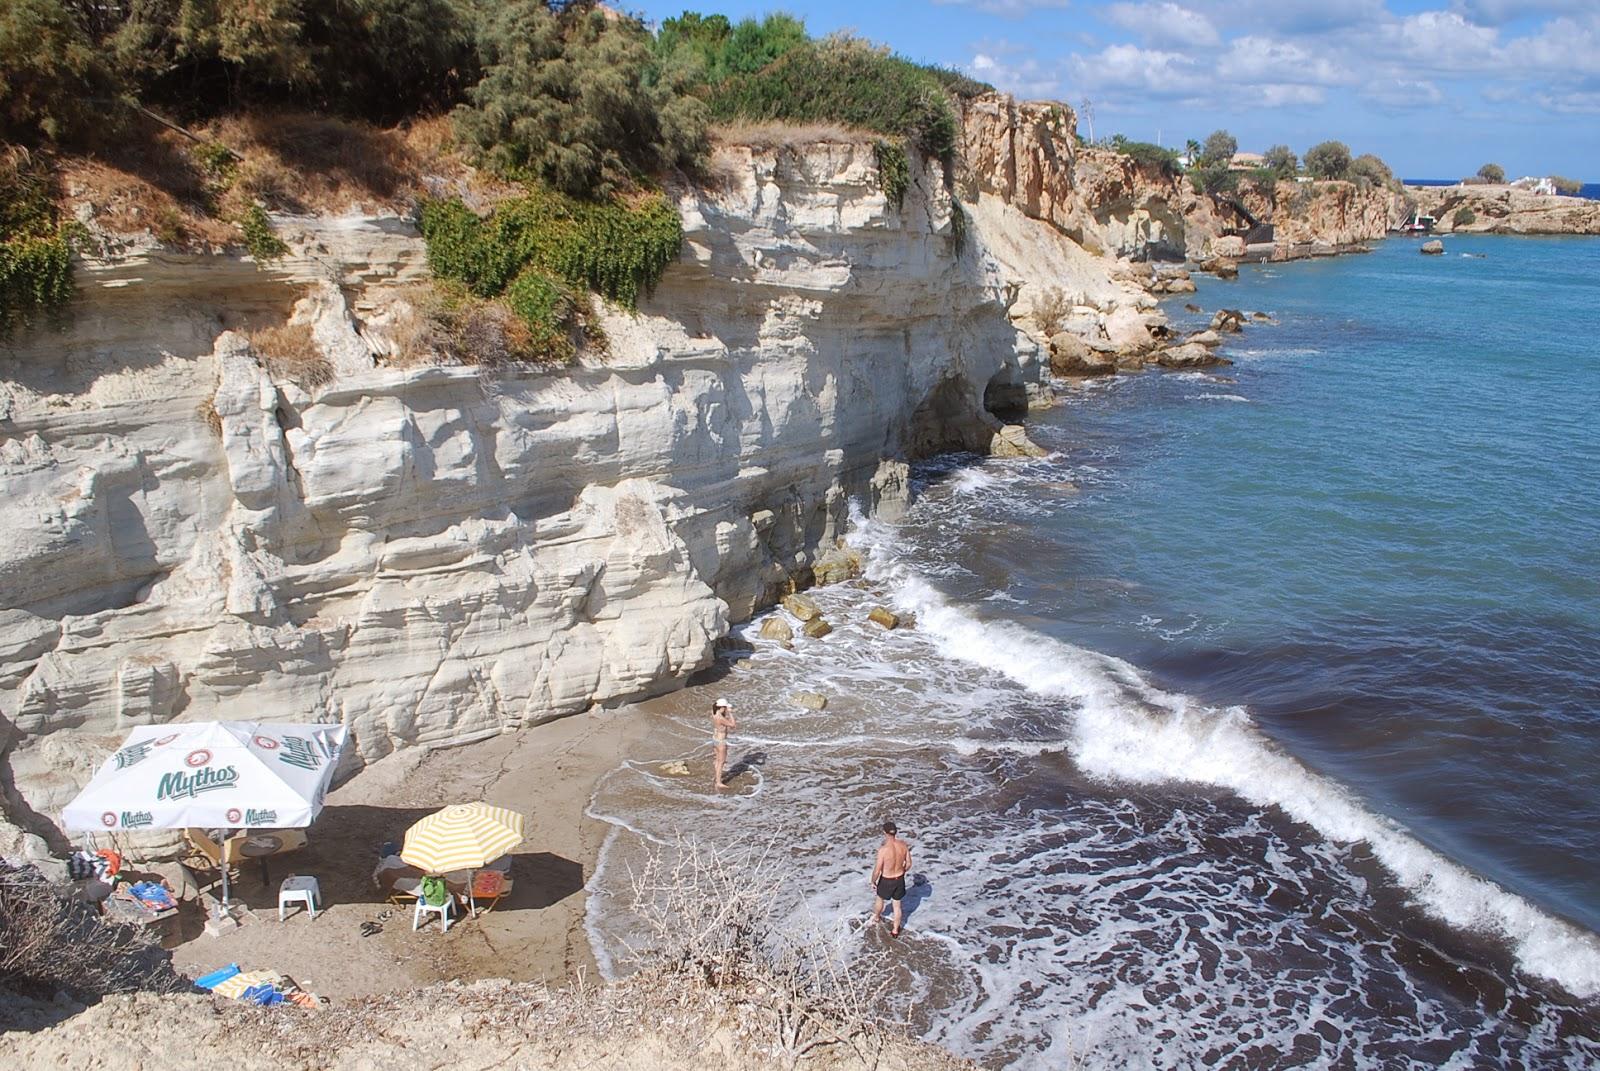 Пляжи Херсонисоса, Крит, Греция. Crete, Greece.